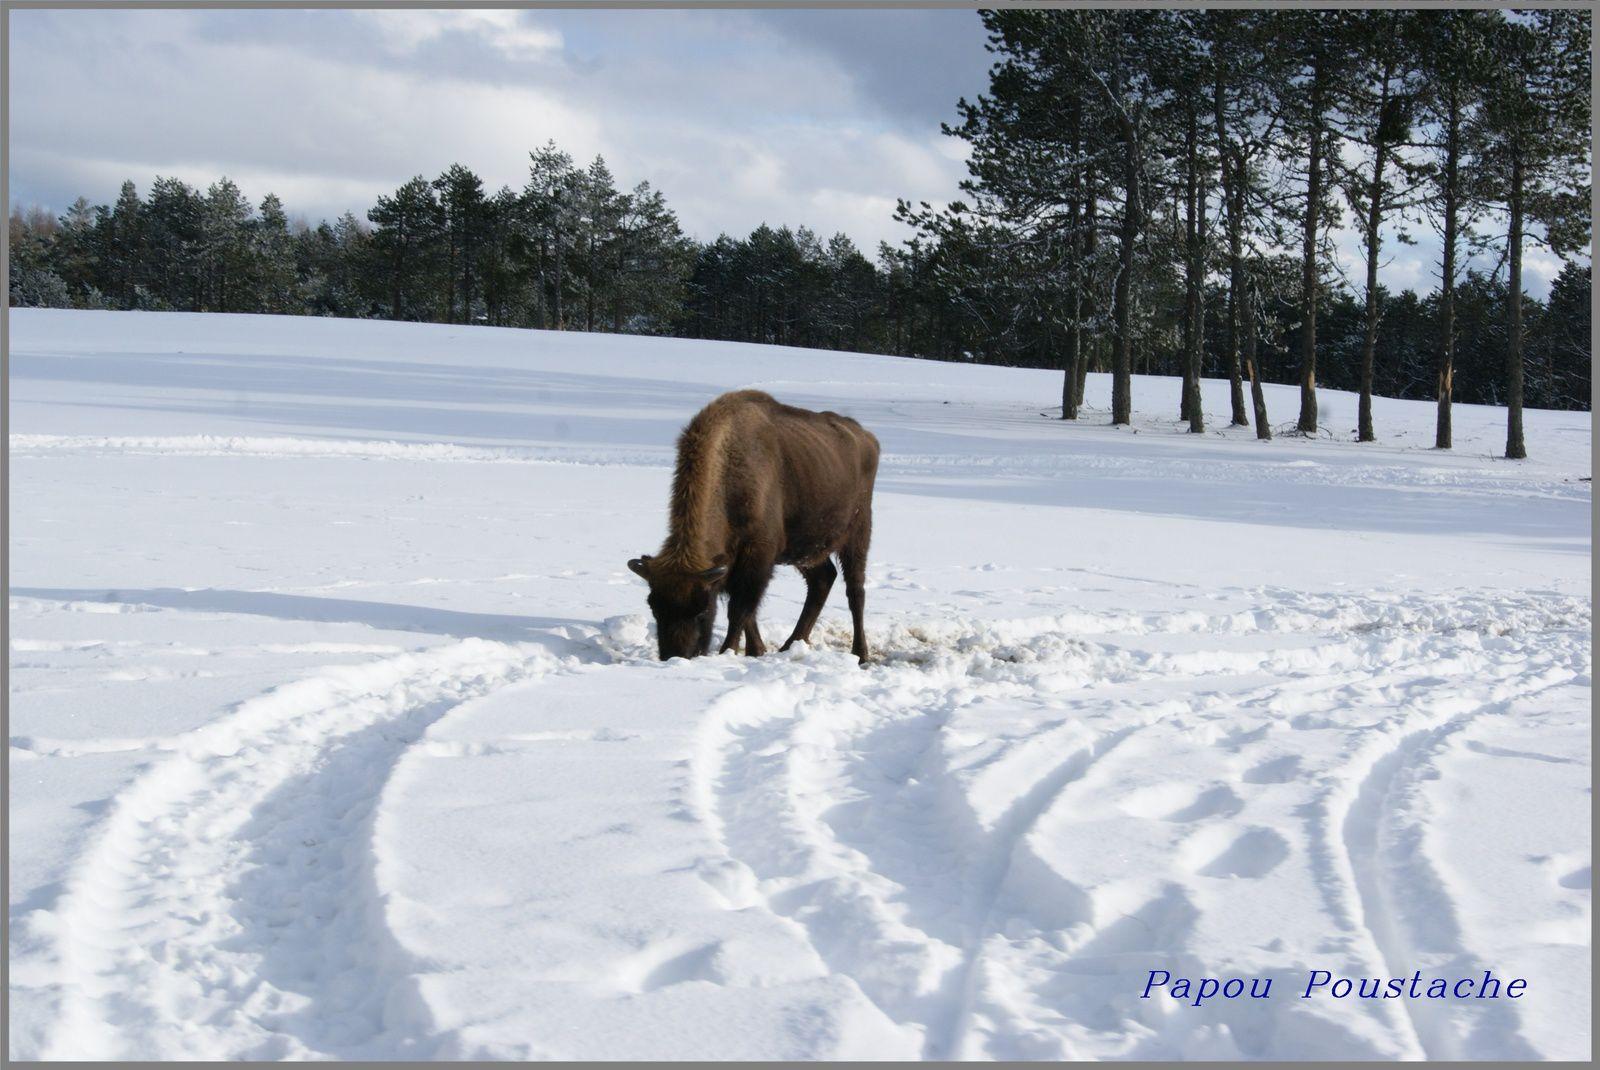 Le bison d'Europe